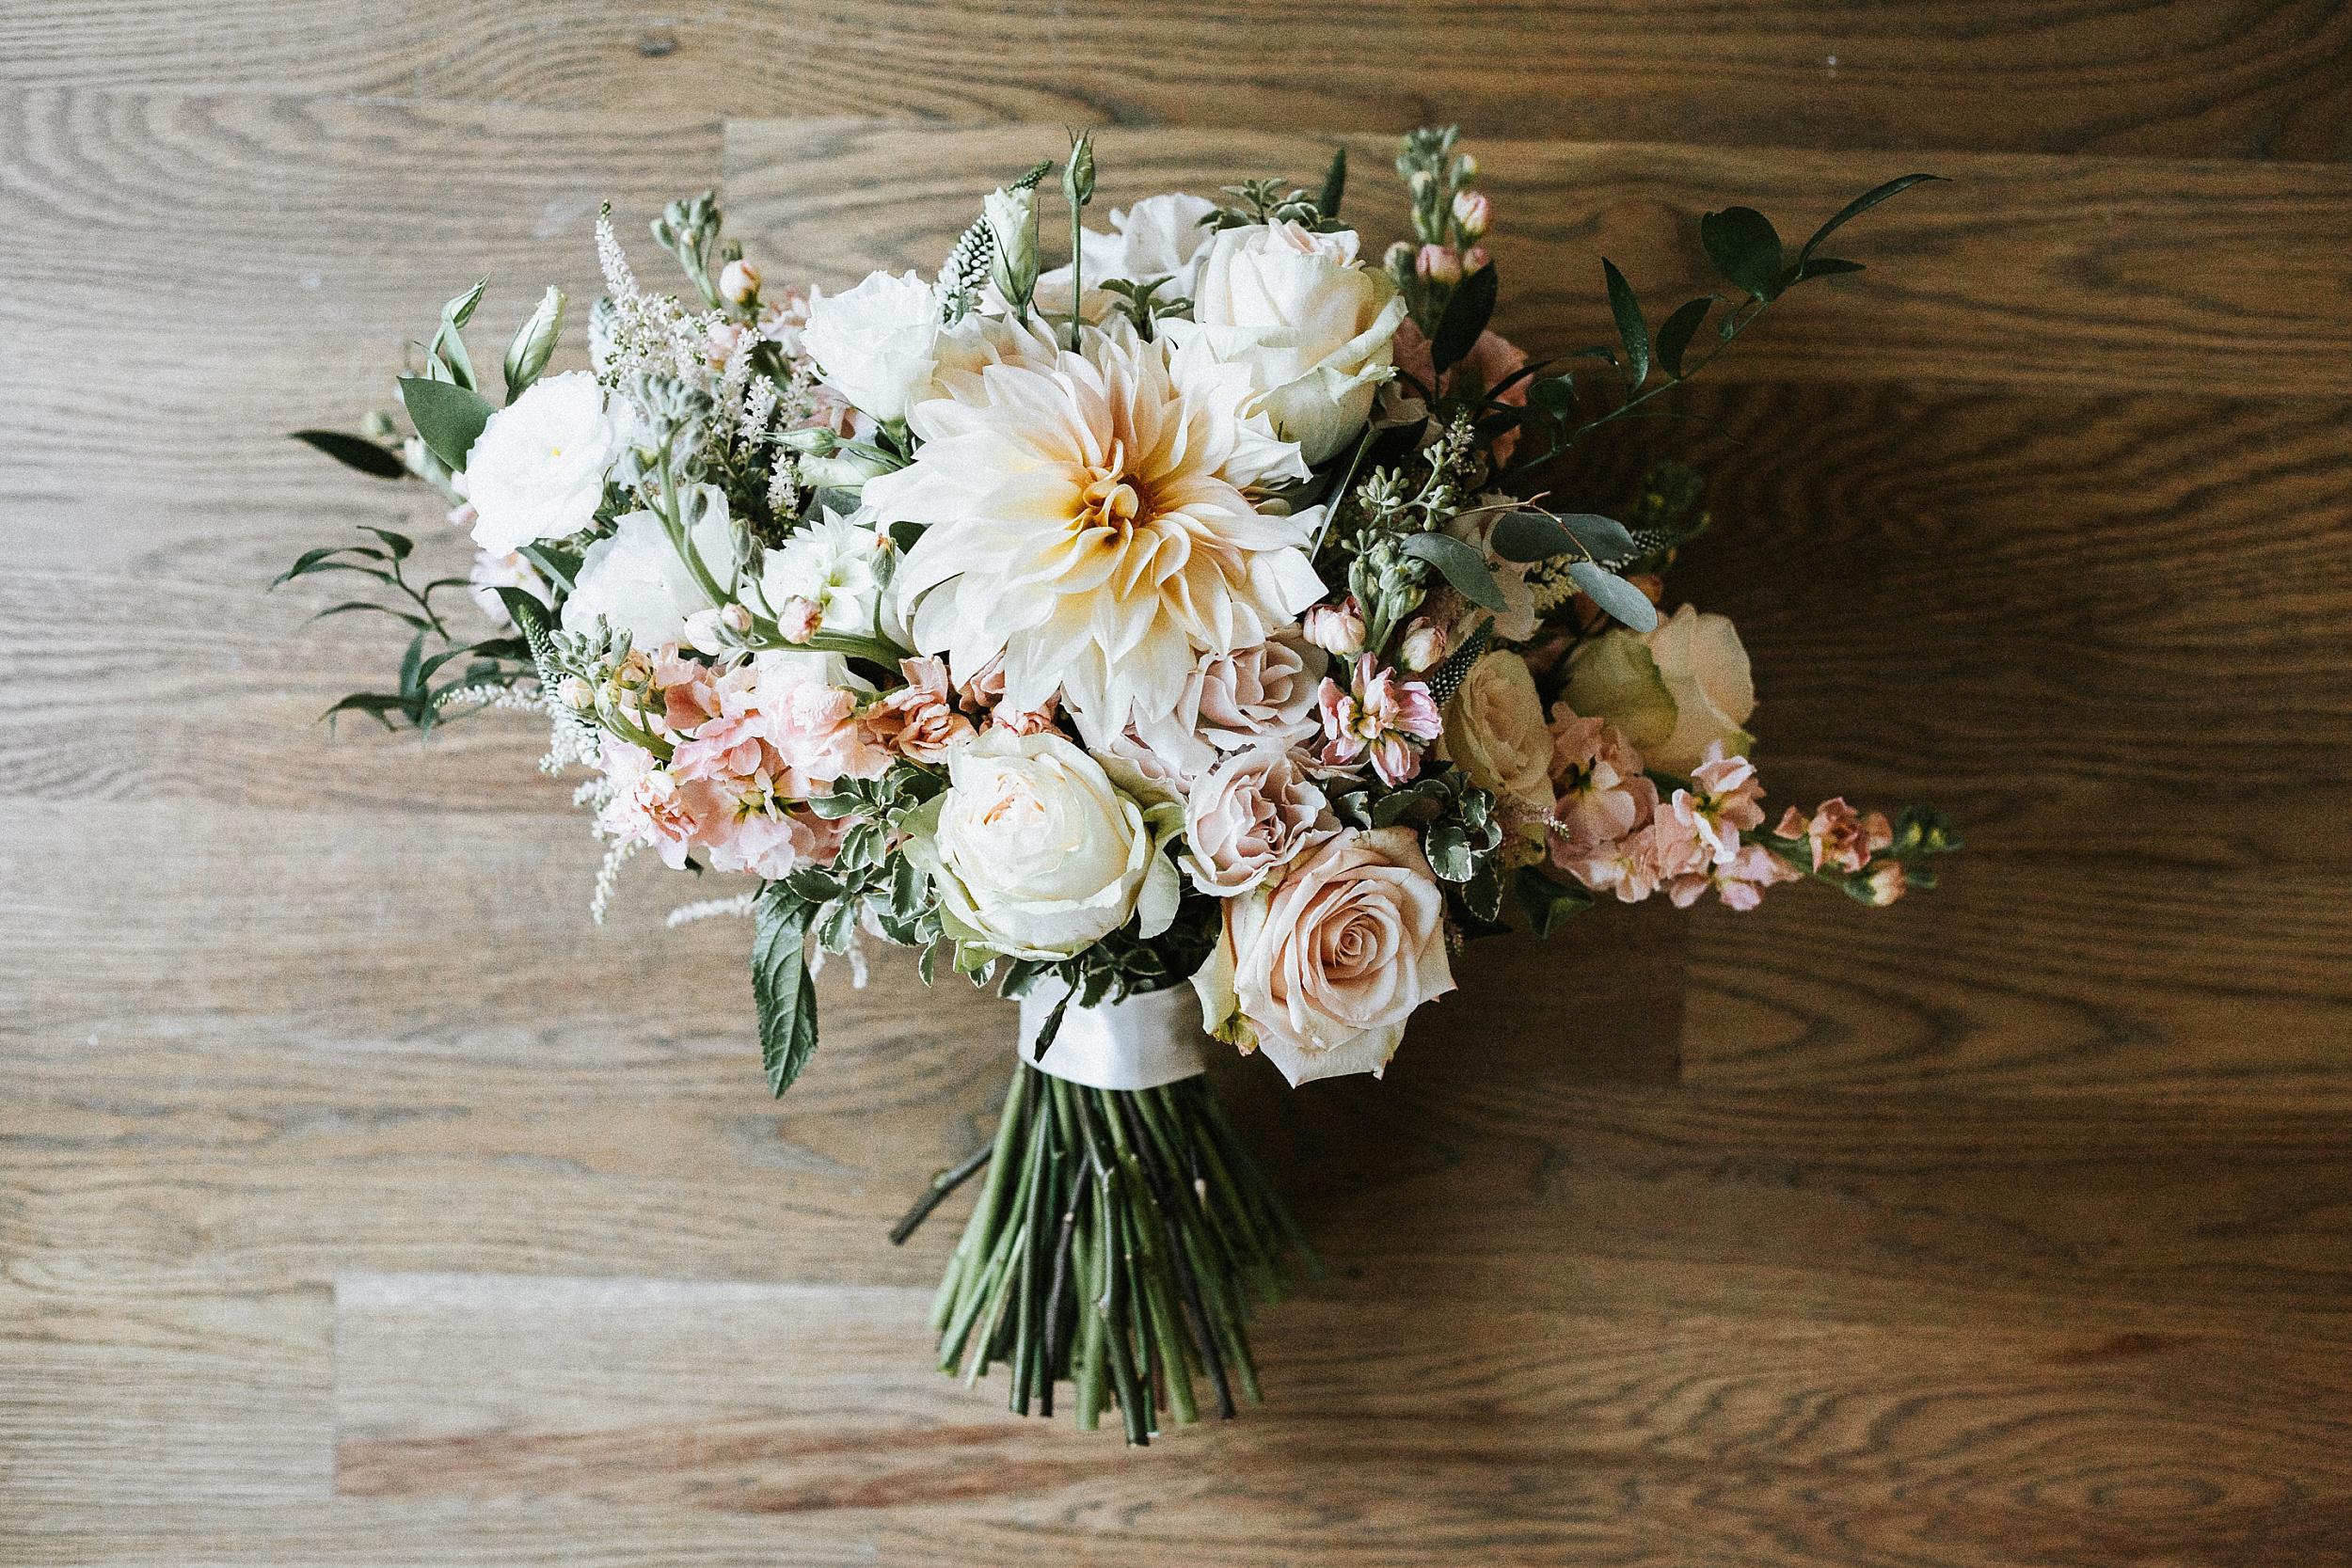 Brooke Townsend Photography - Cincinnati Wedding Photographer (13 of 170).jpg